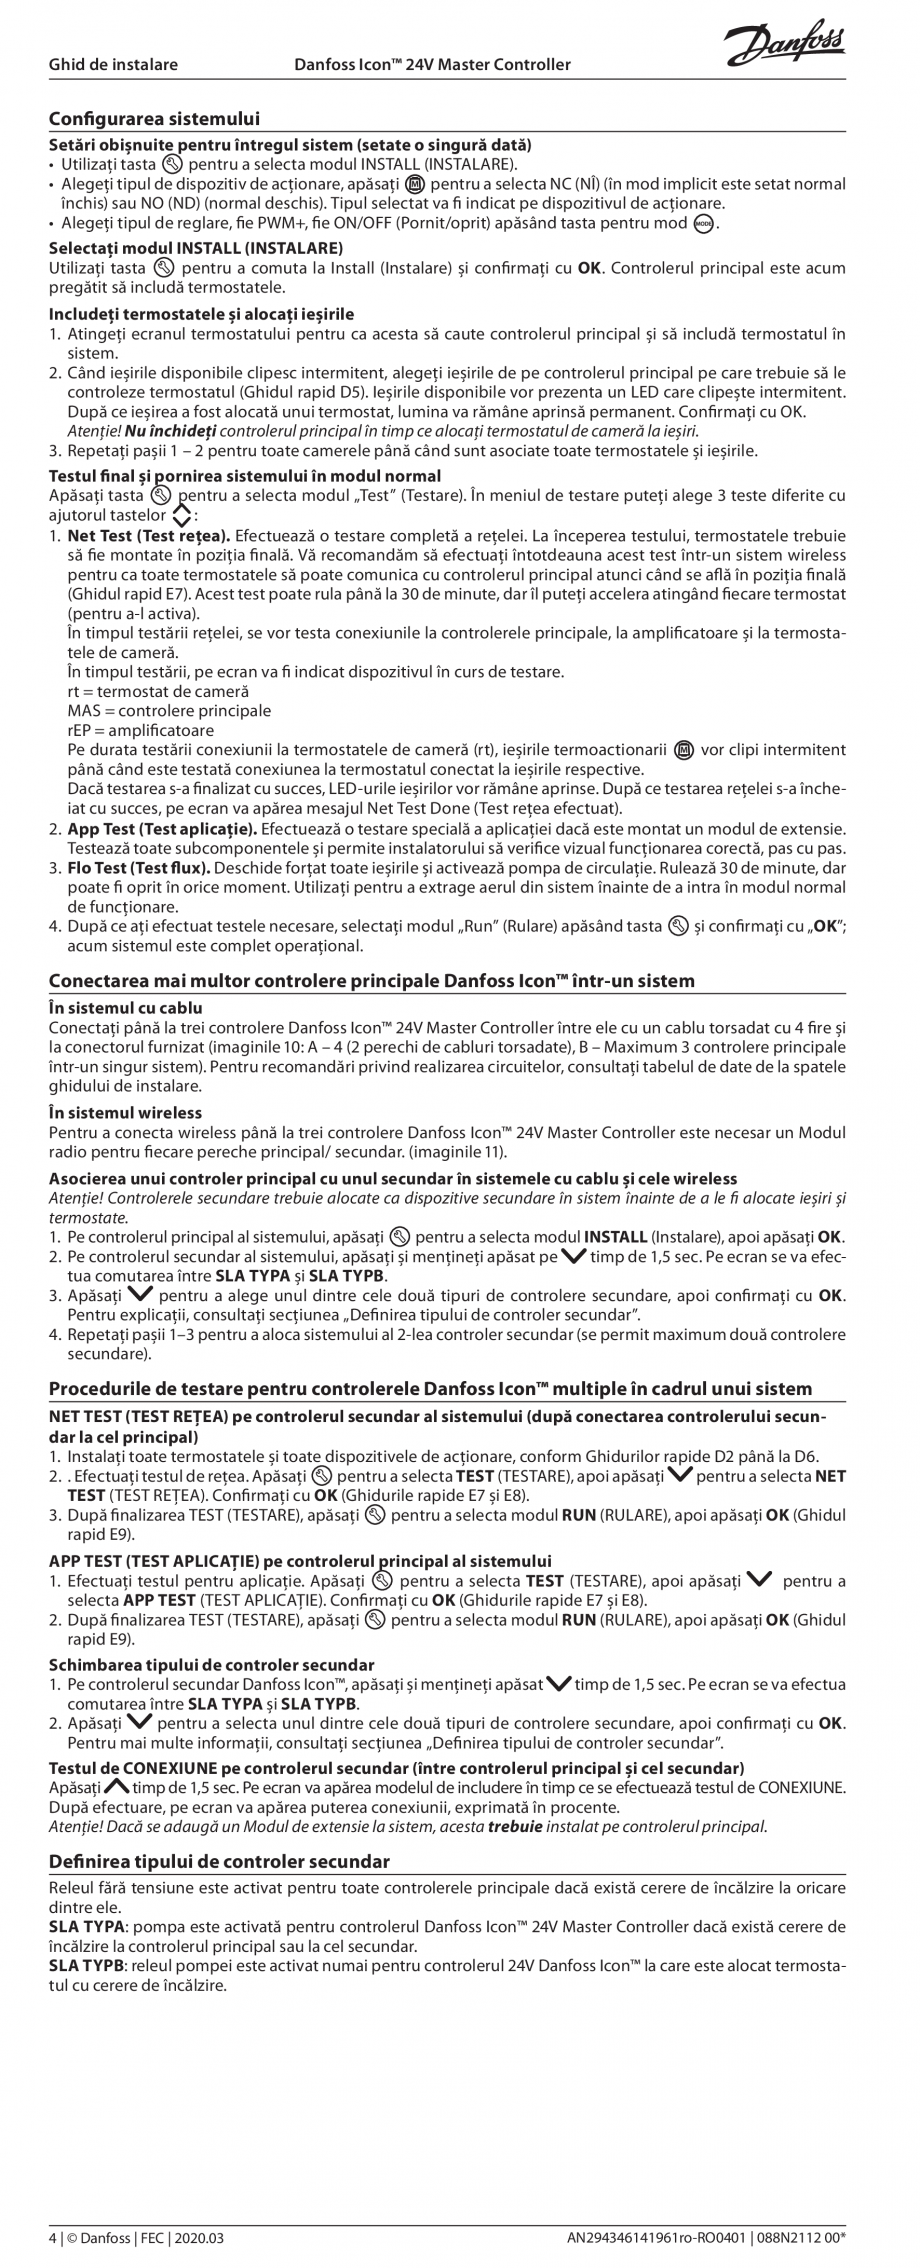 Pagina 4 - Ghid de instalare pentru Danfoss Icon™ 24V Master Controller - sistem inteligent de...